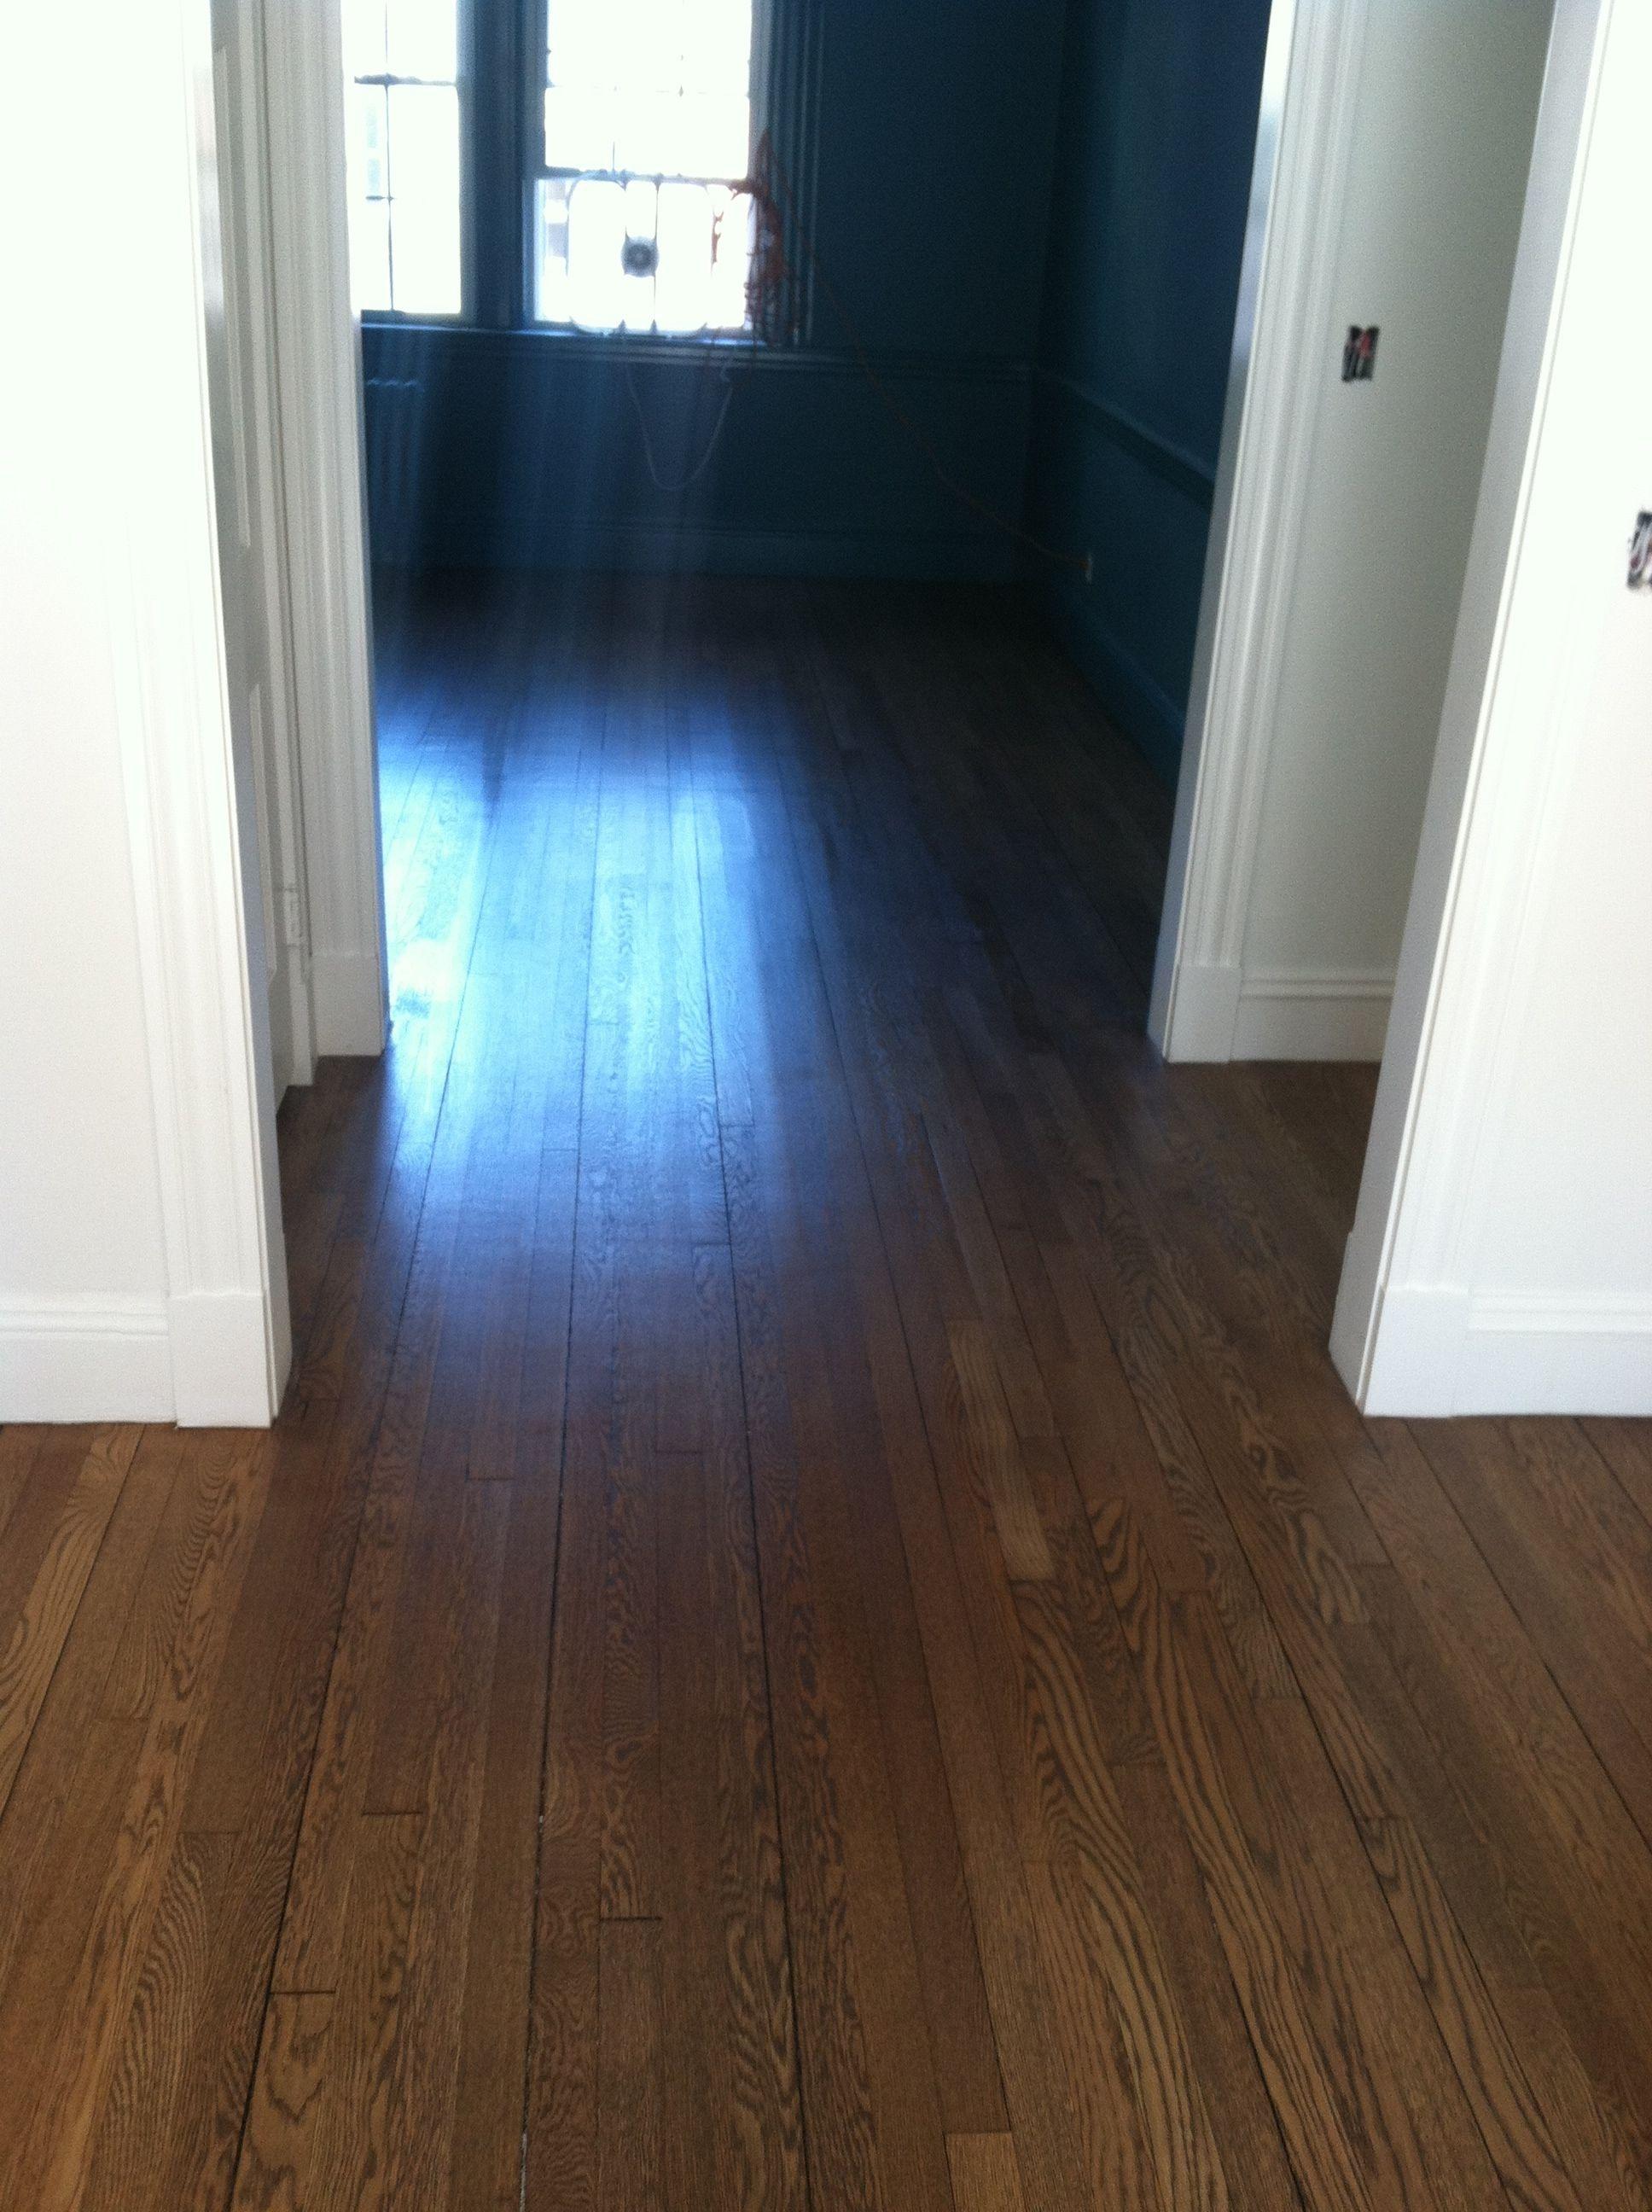 Bona mega hardwood floor finish meze blog for Oakland flooring